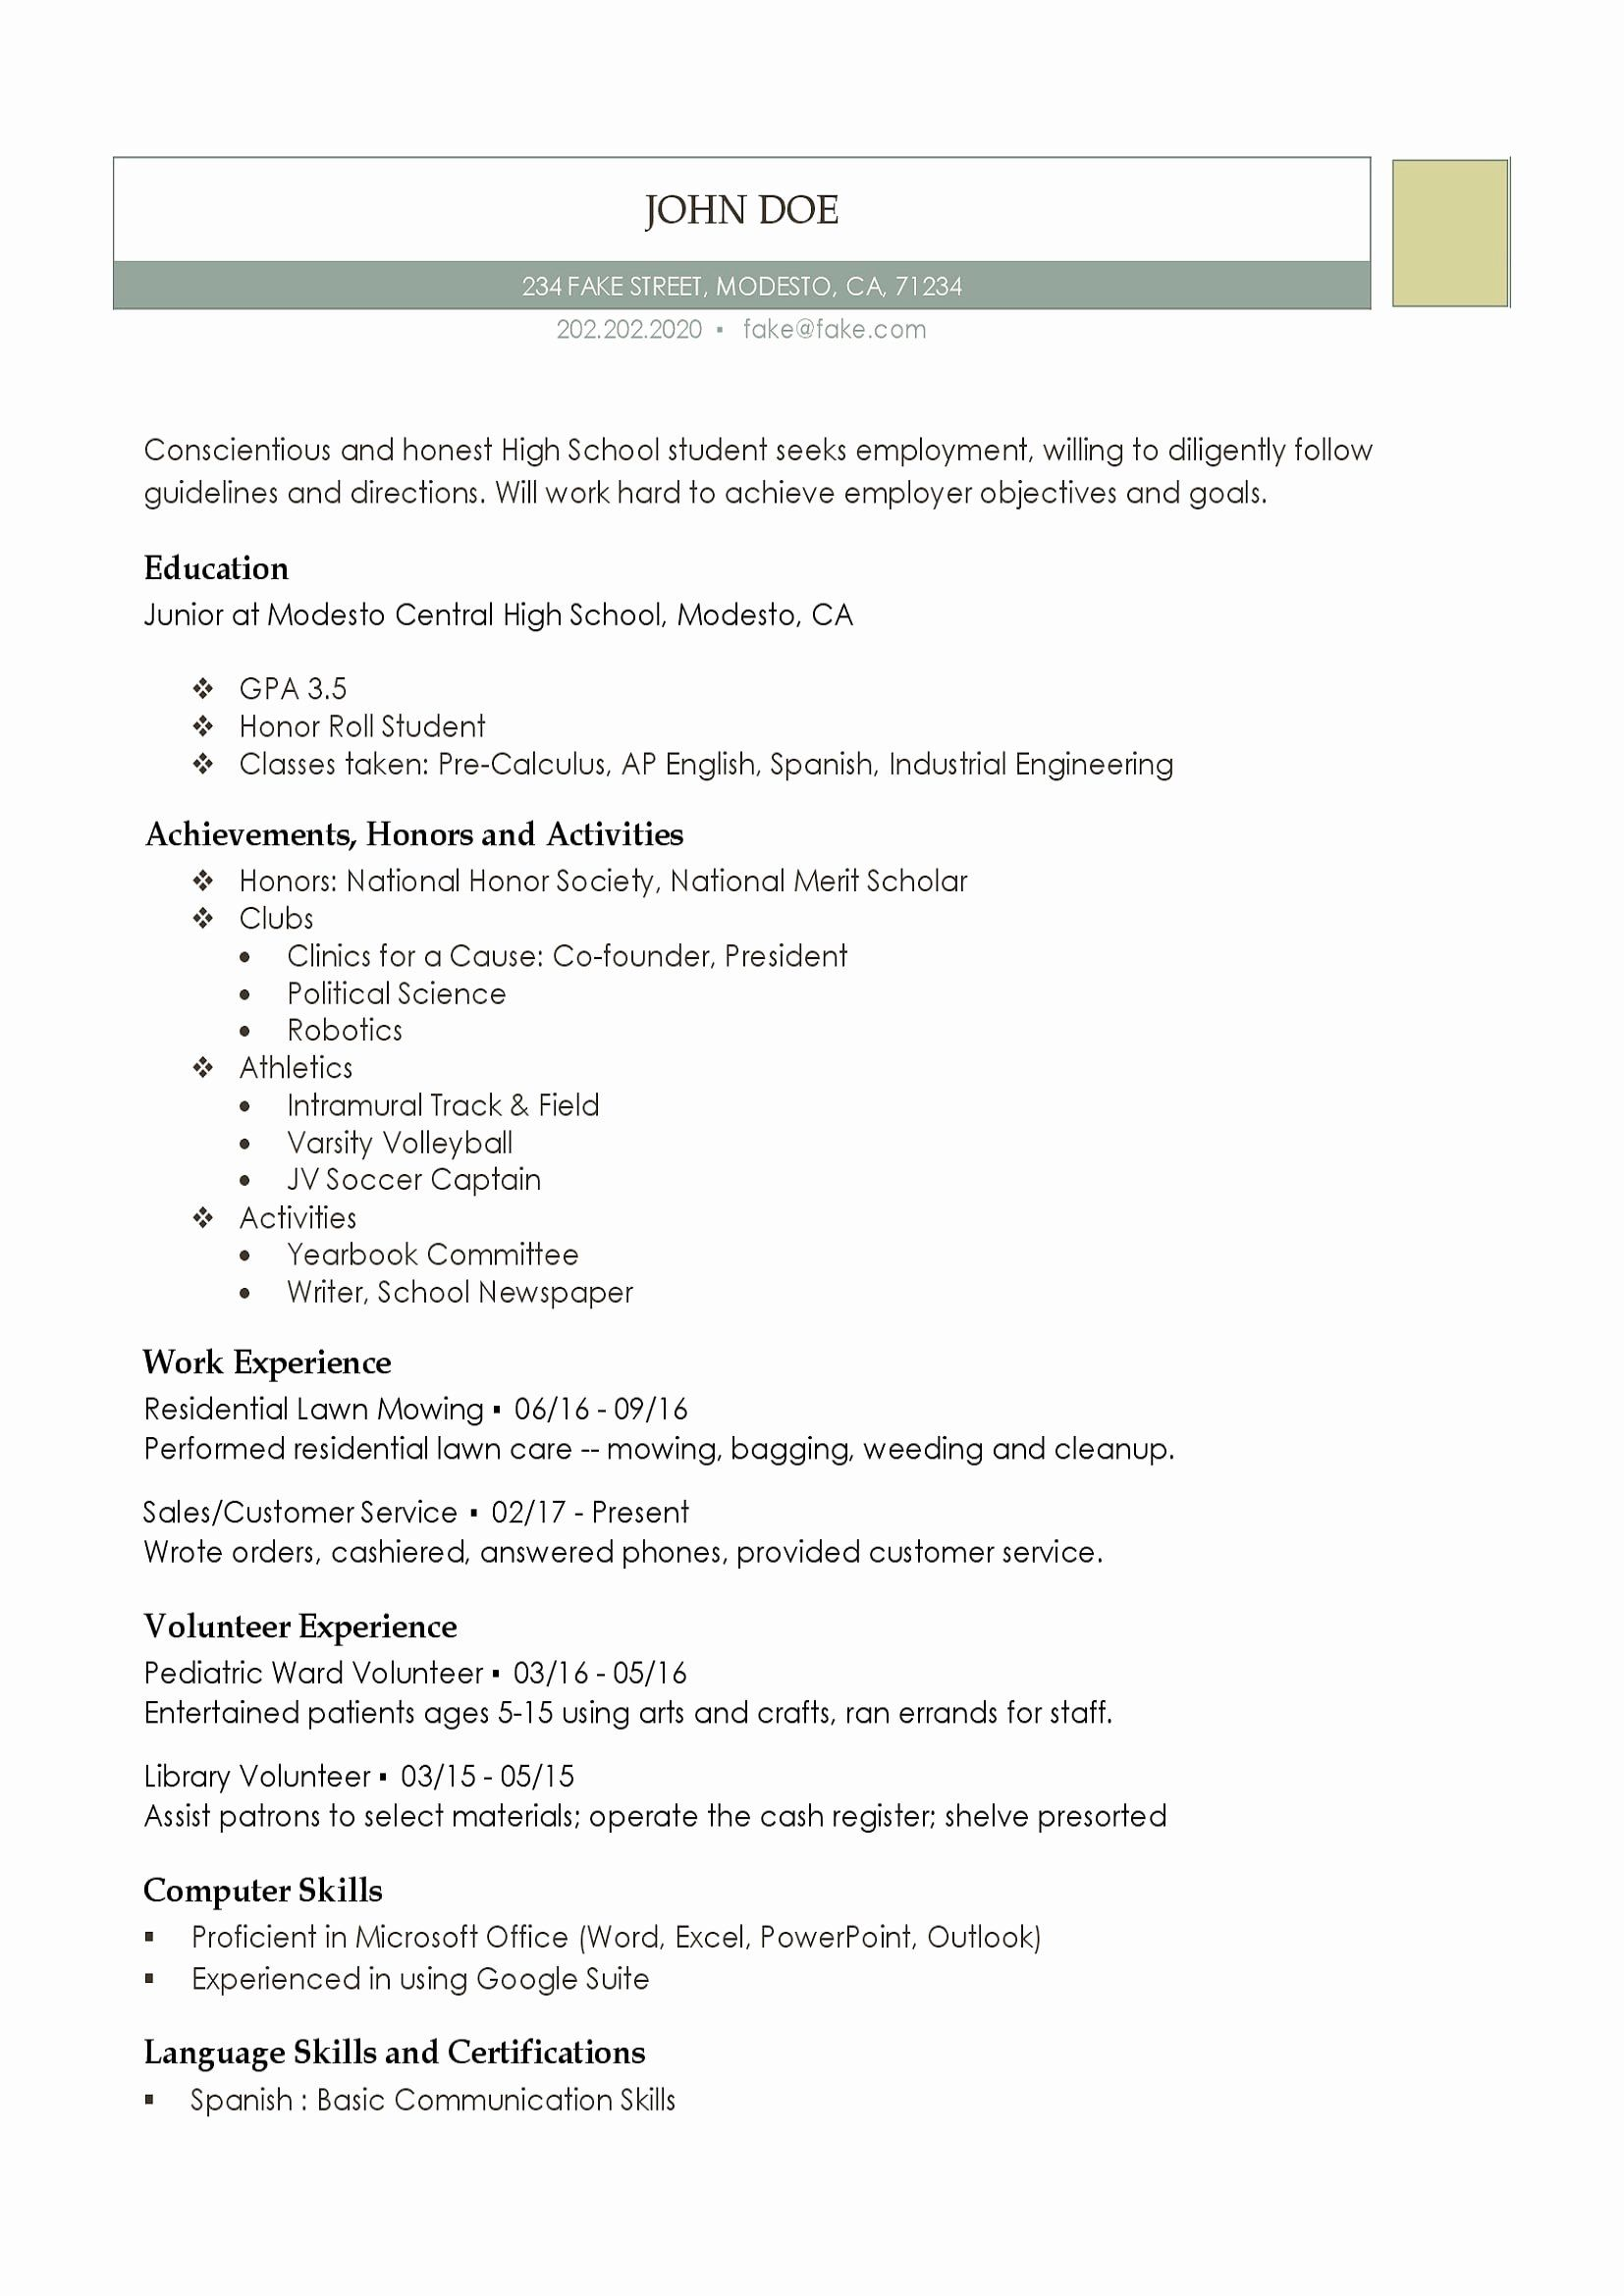 Resume High School Student Beautiful High School Resume Resumes Perfect For High School Student Resume Template High School Resume High School Resume Template